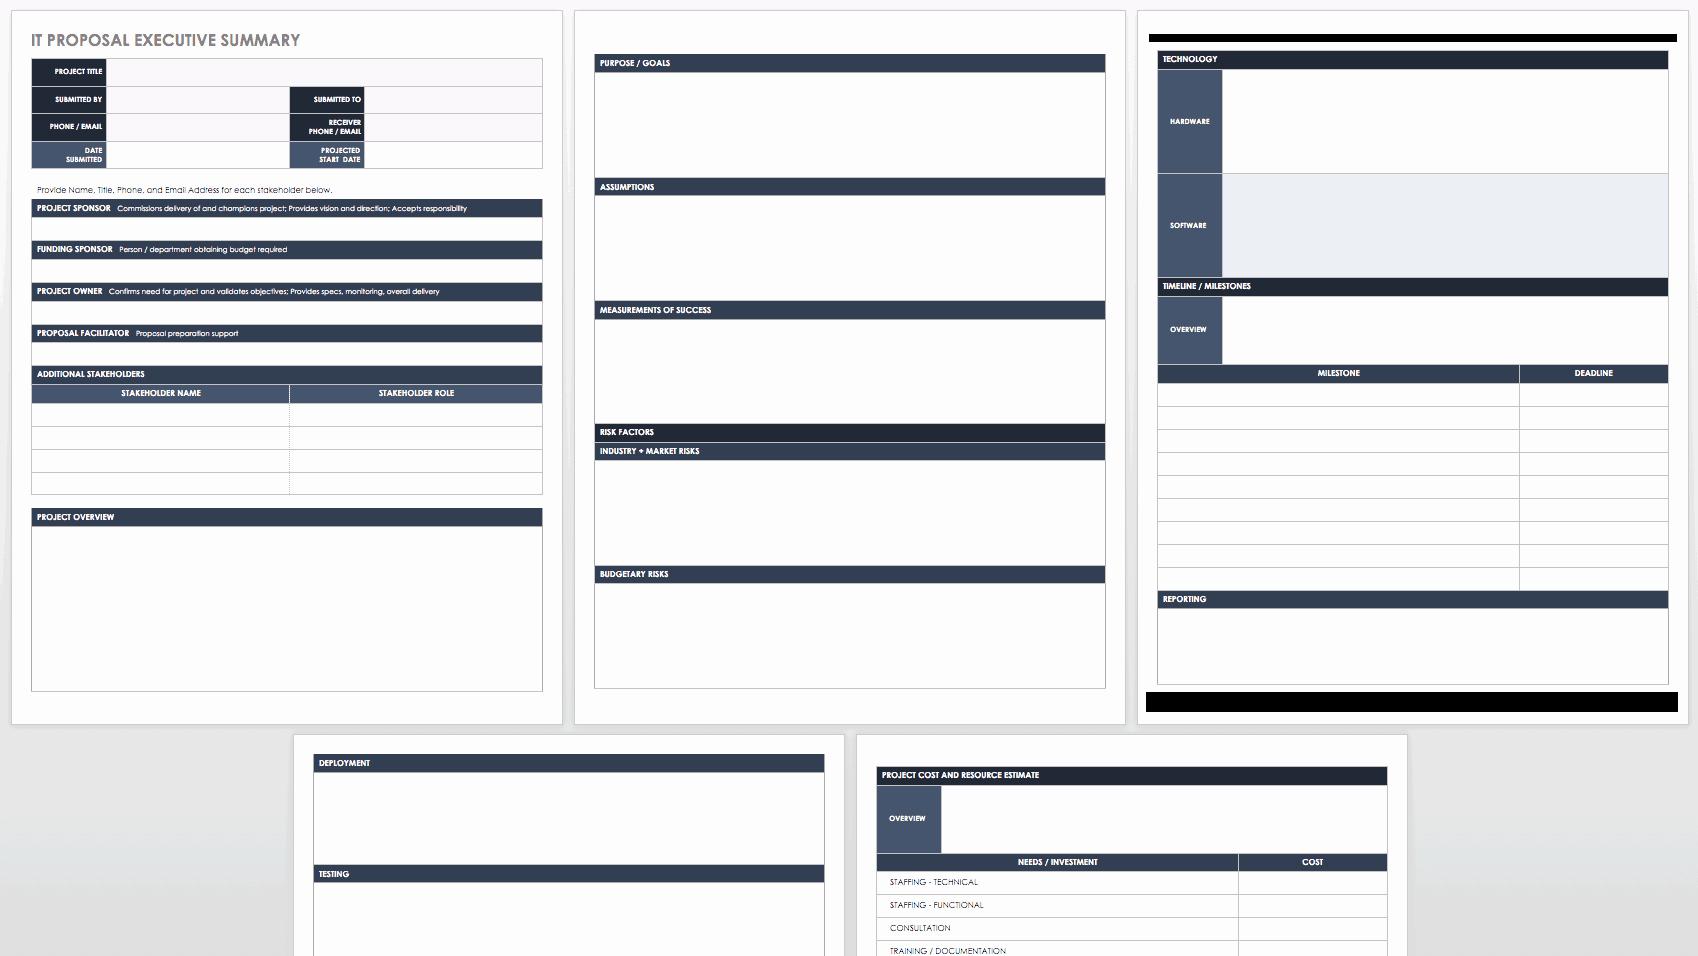 Executive Summary Outline Template Inspirational Free Executive Summary Templates